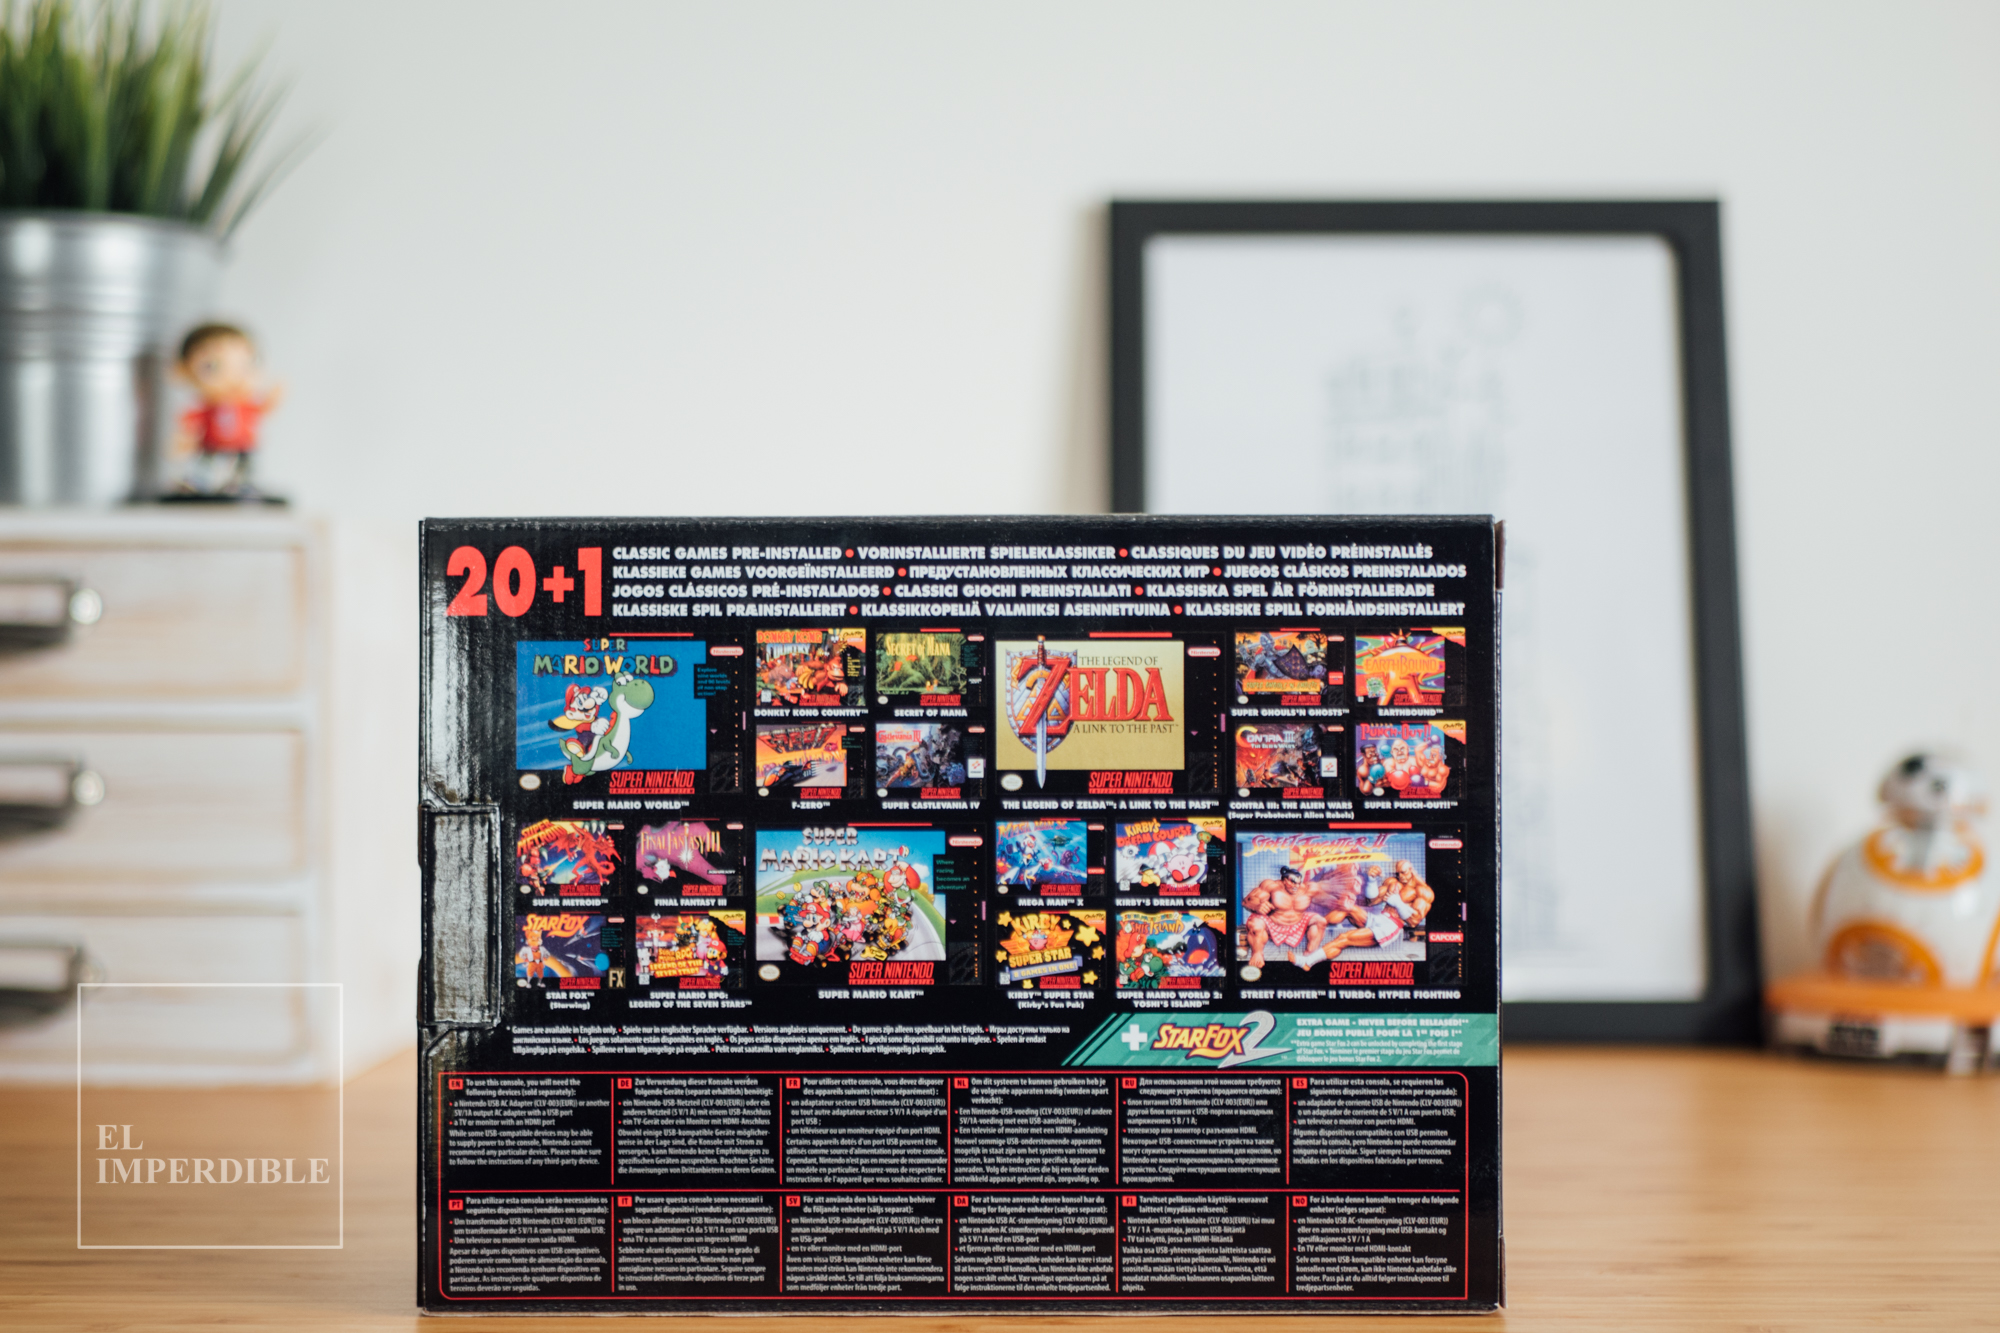 Realmente merece la pena comprar la SNES Classic Mini